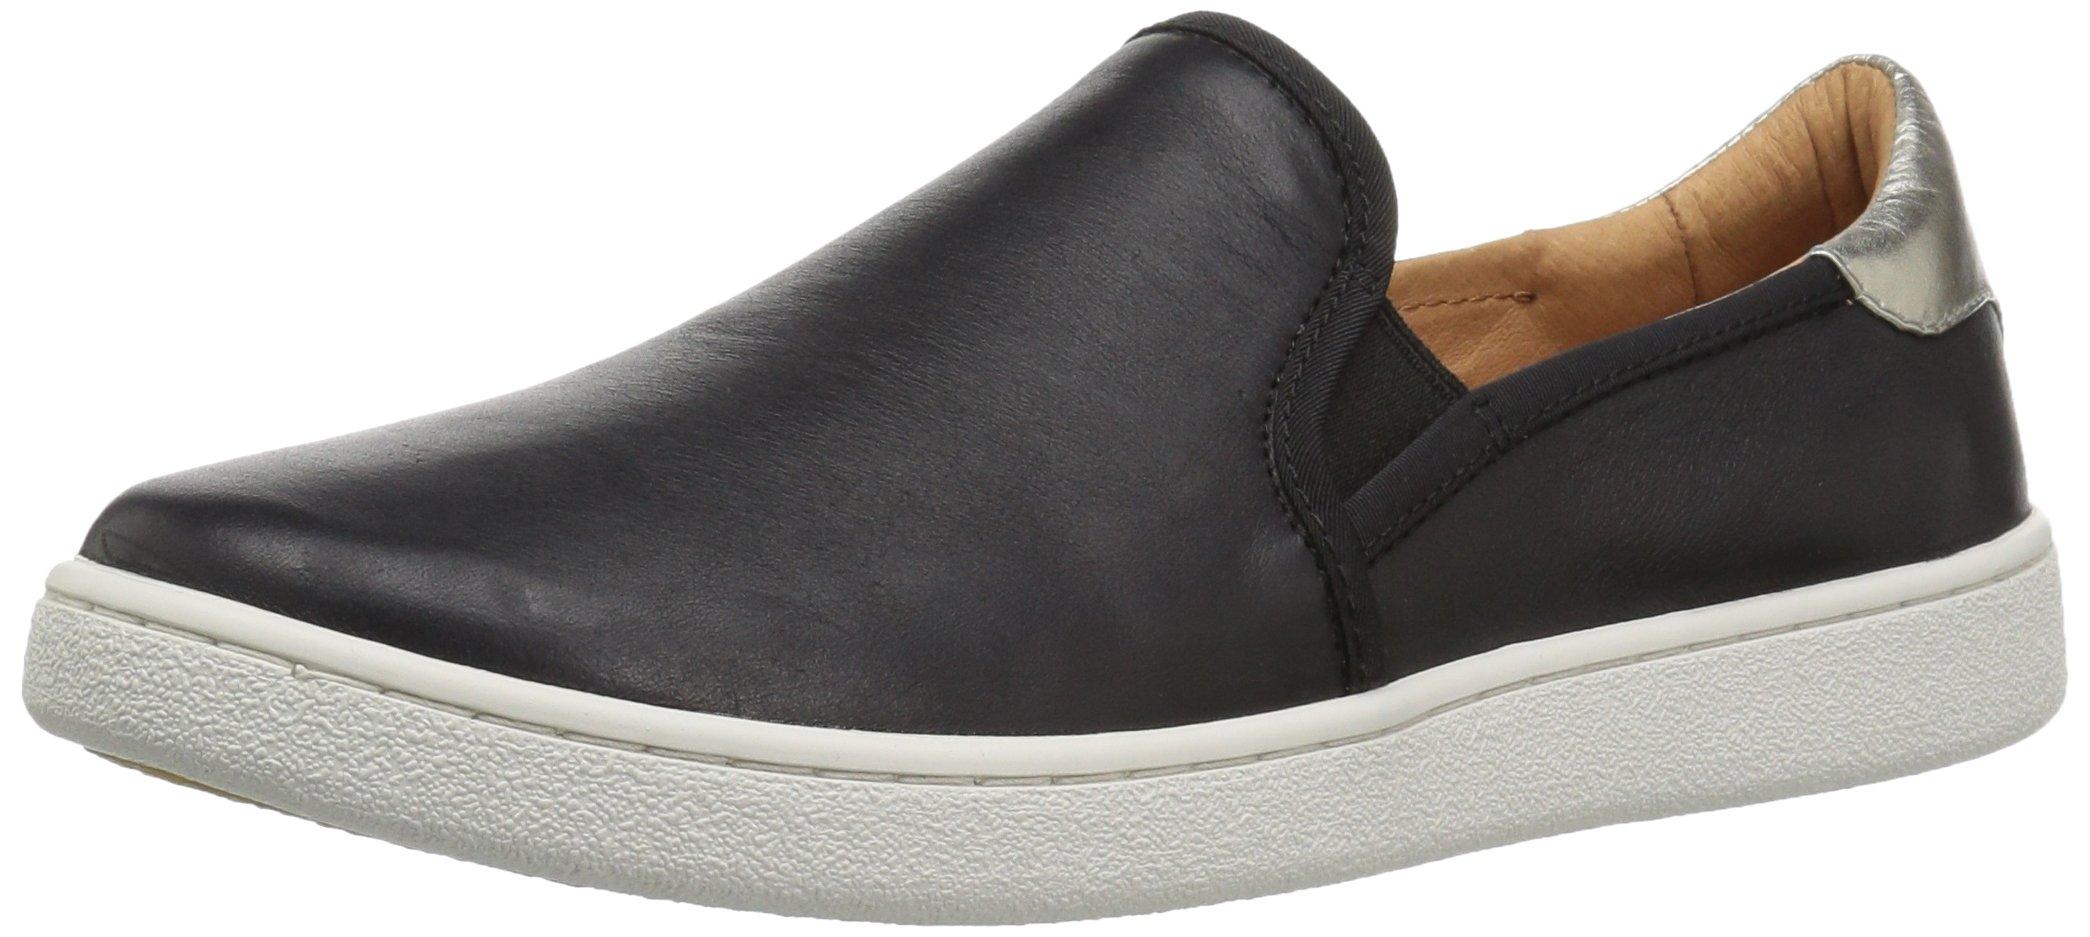 UGG Women's Cas Fashion Sneaker,Black,8 M US